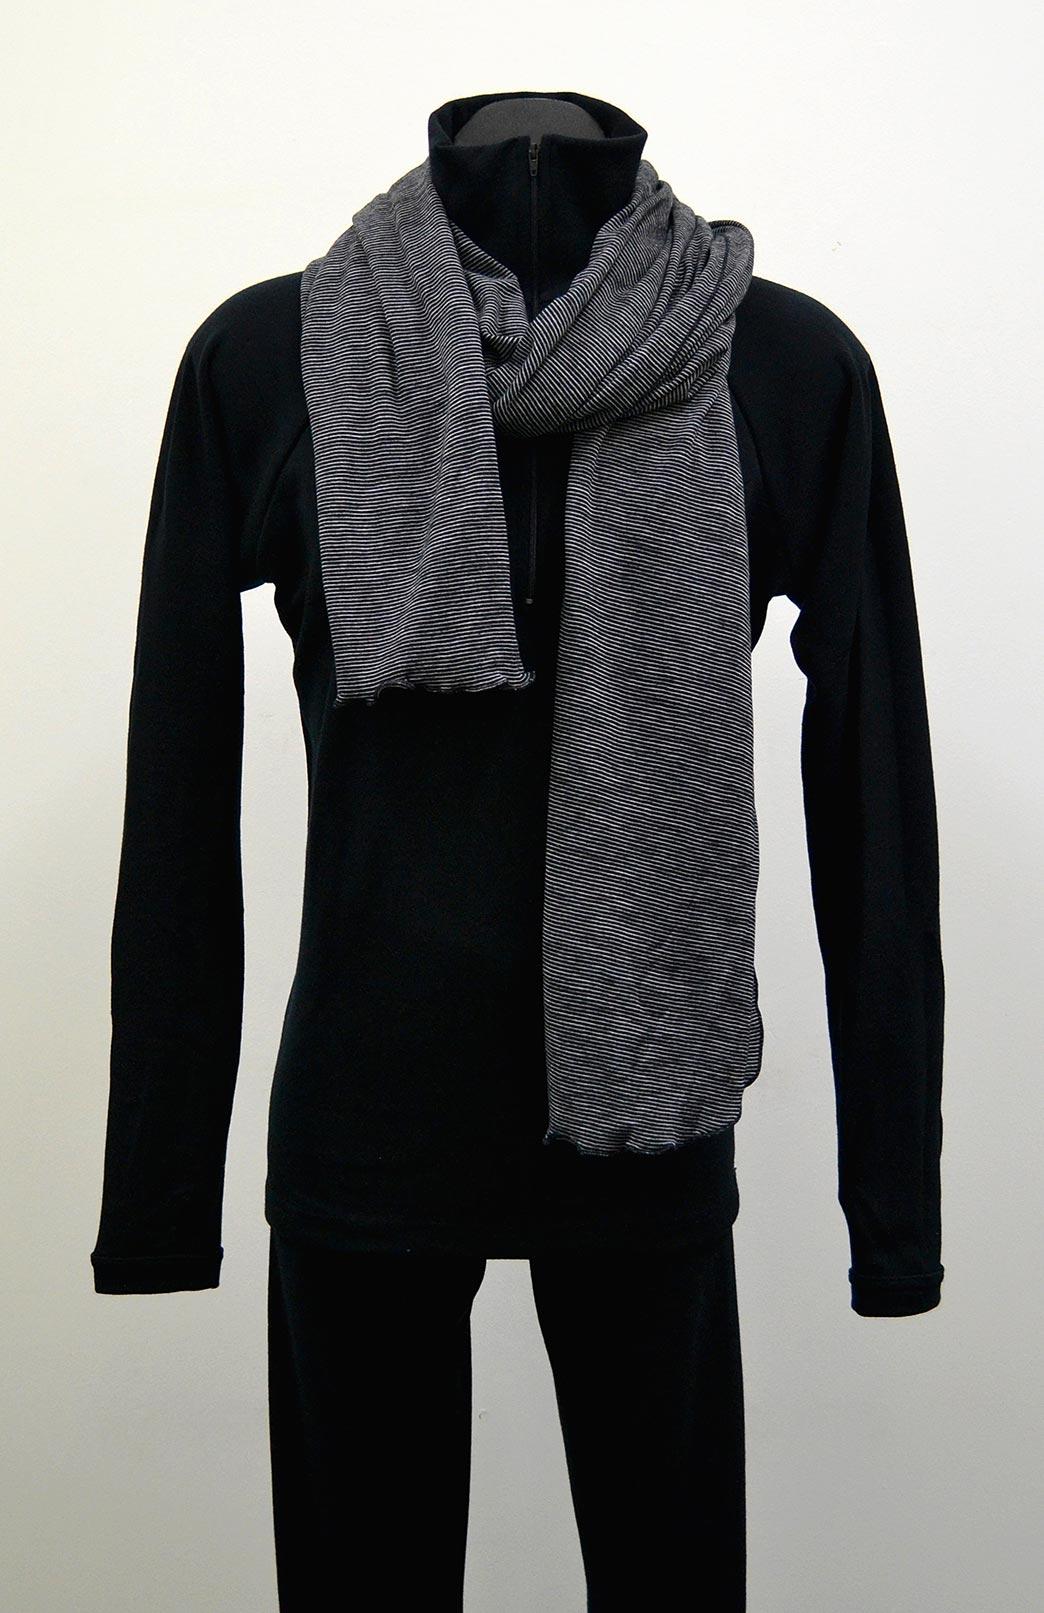 Men's Wide Merino Scarf - Men's 100% Merino Wool Wide Scarf - Smitten Merino Tasmania Australia